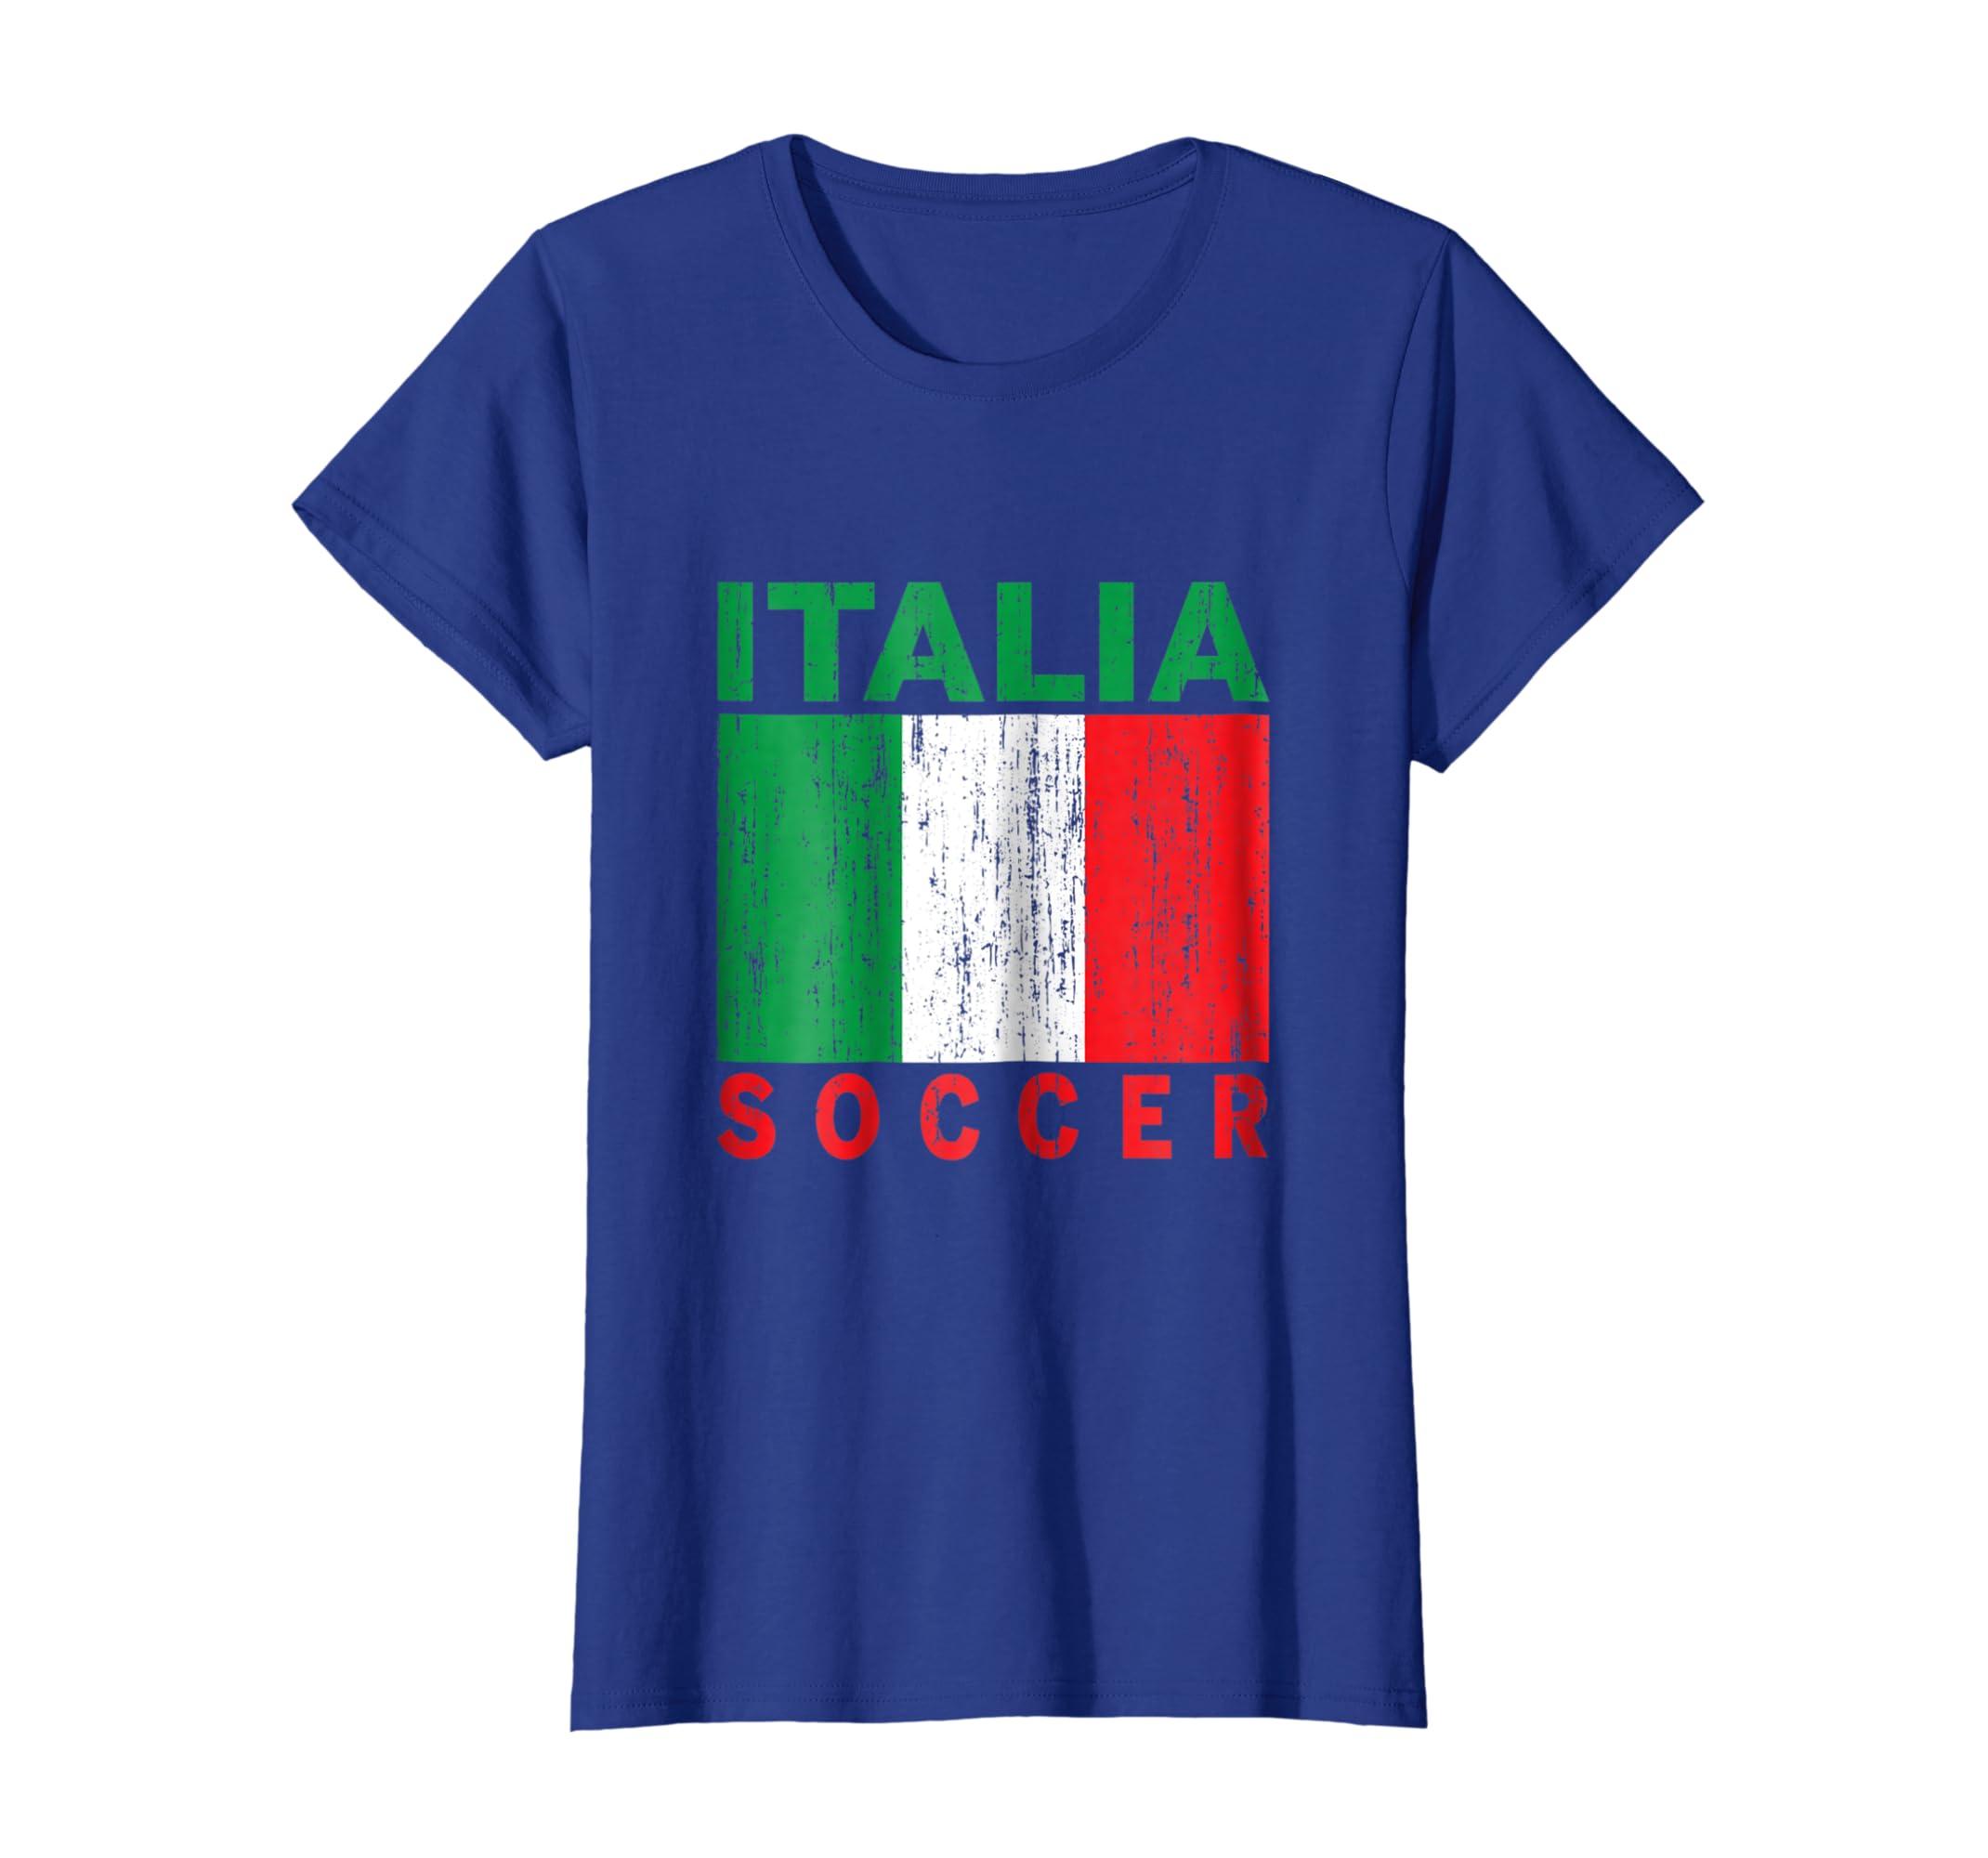 45a5798511 Amazon.com  Italia Soccer